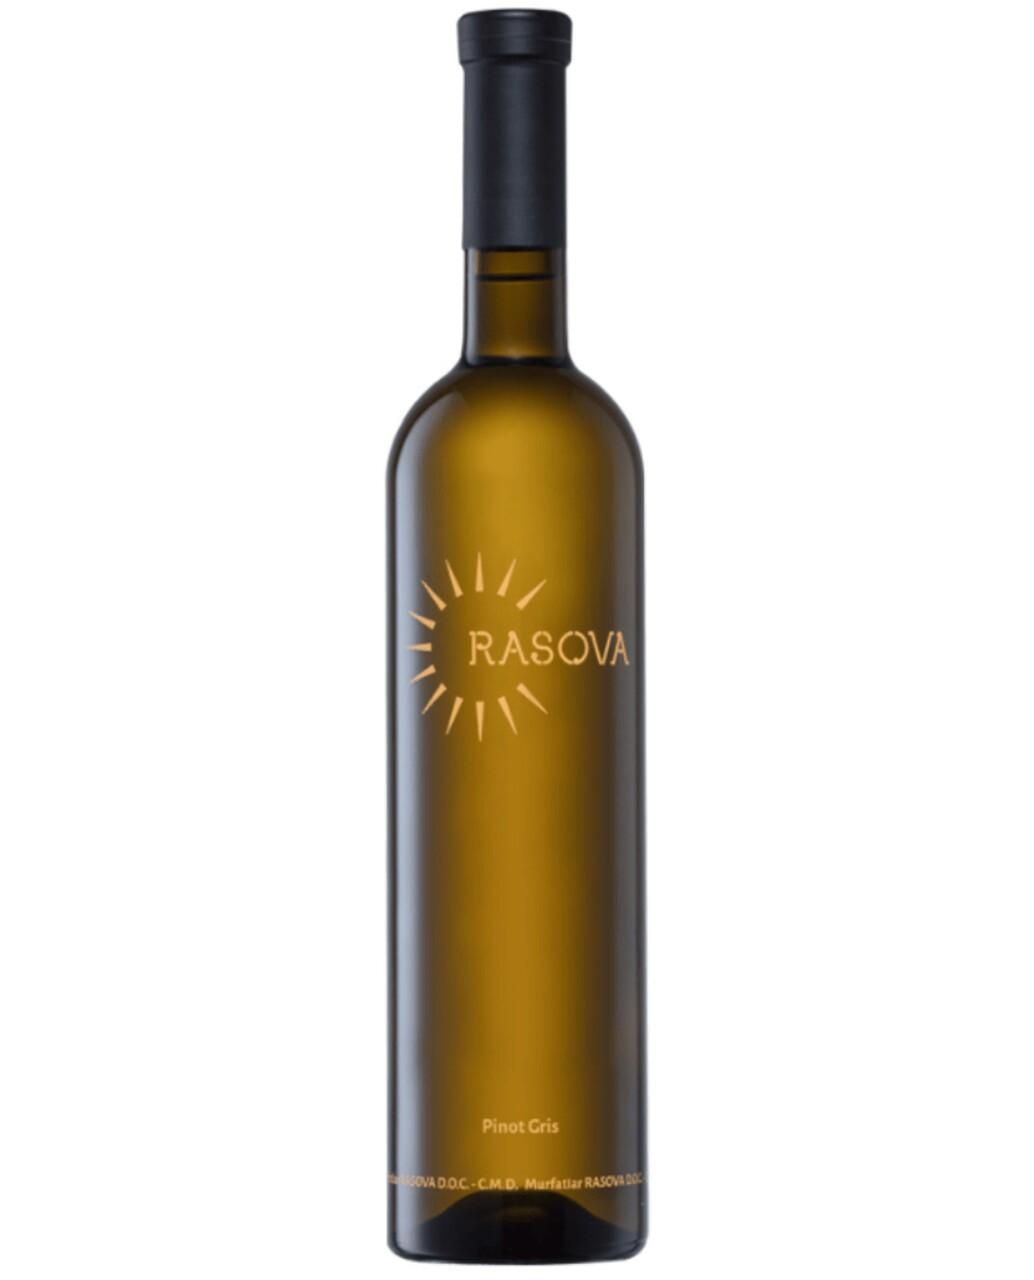 Rasova Premium Pinot Gris